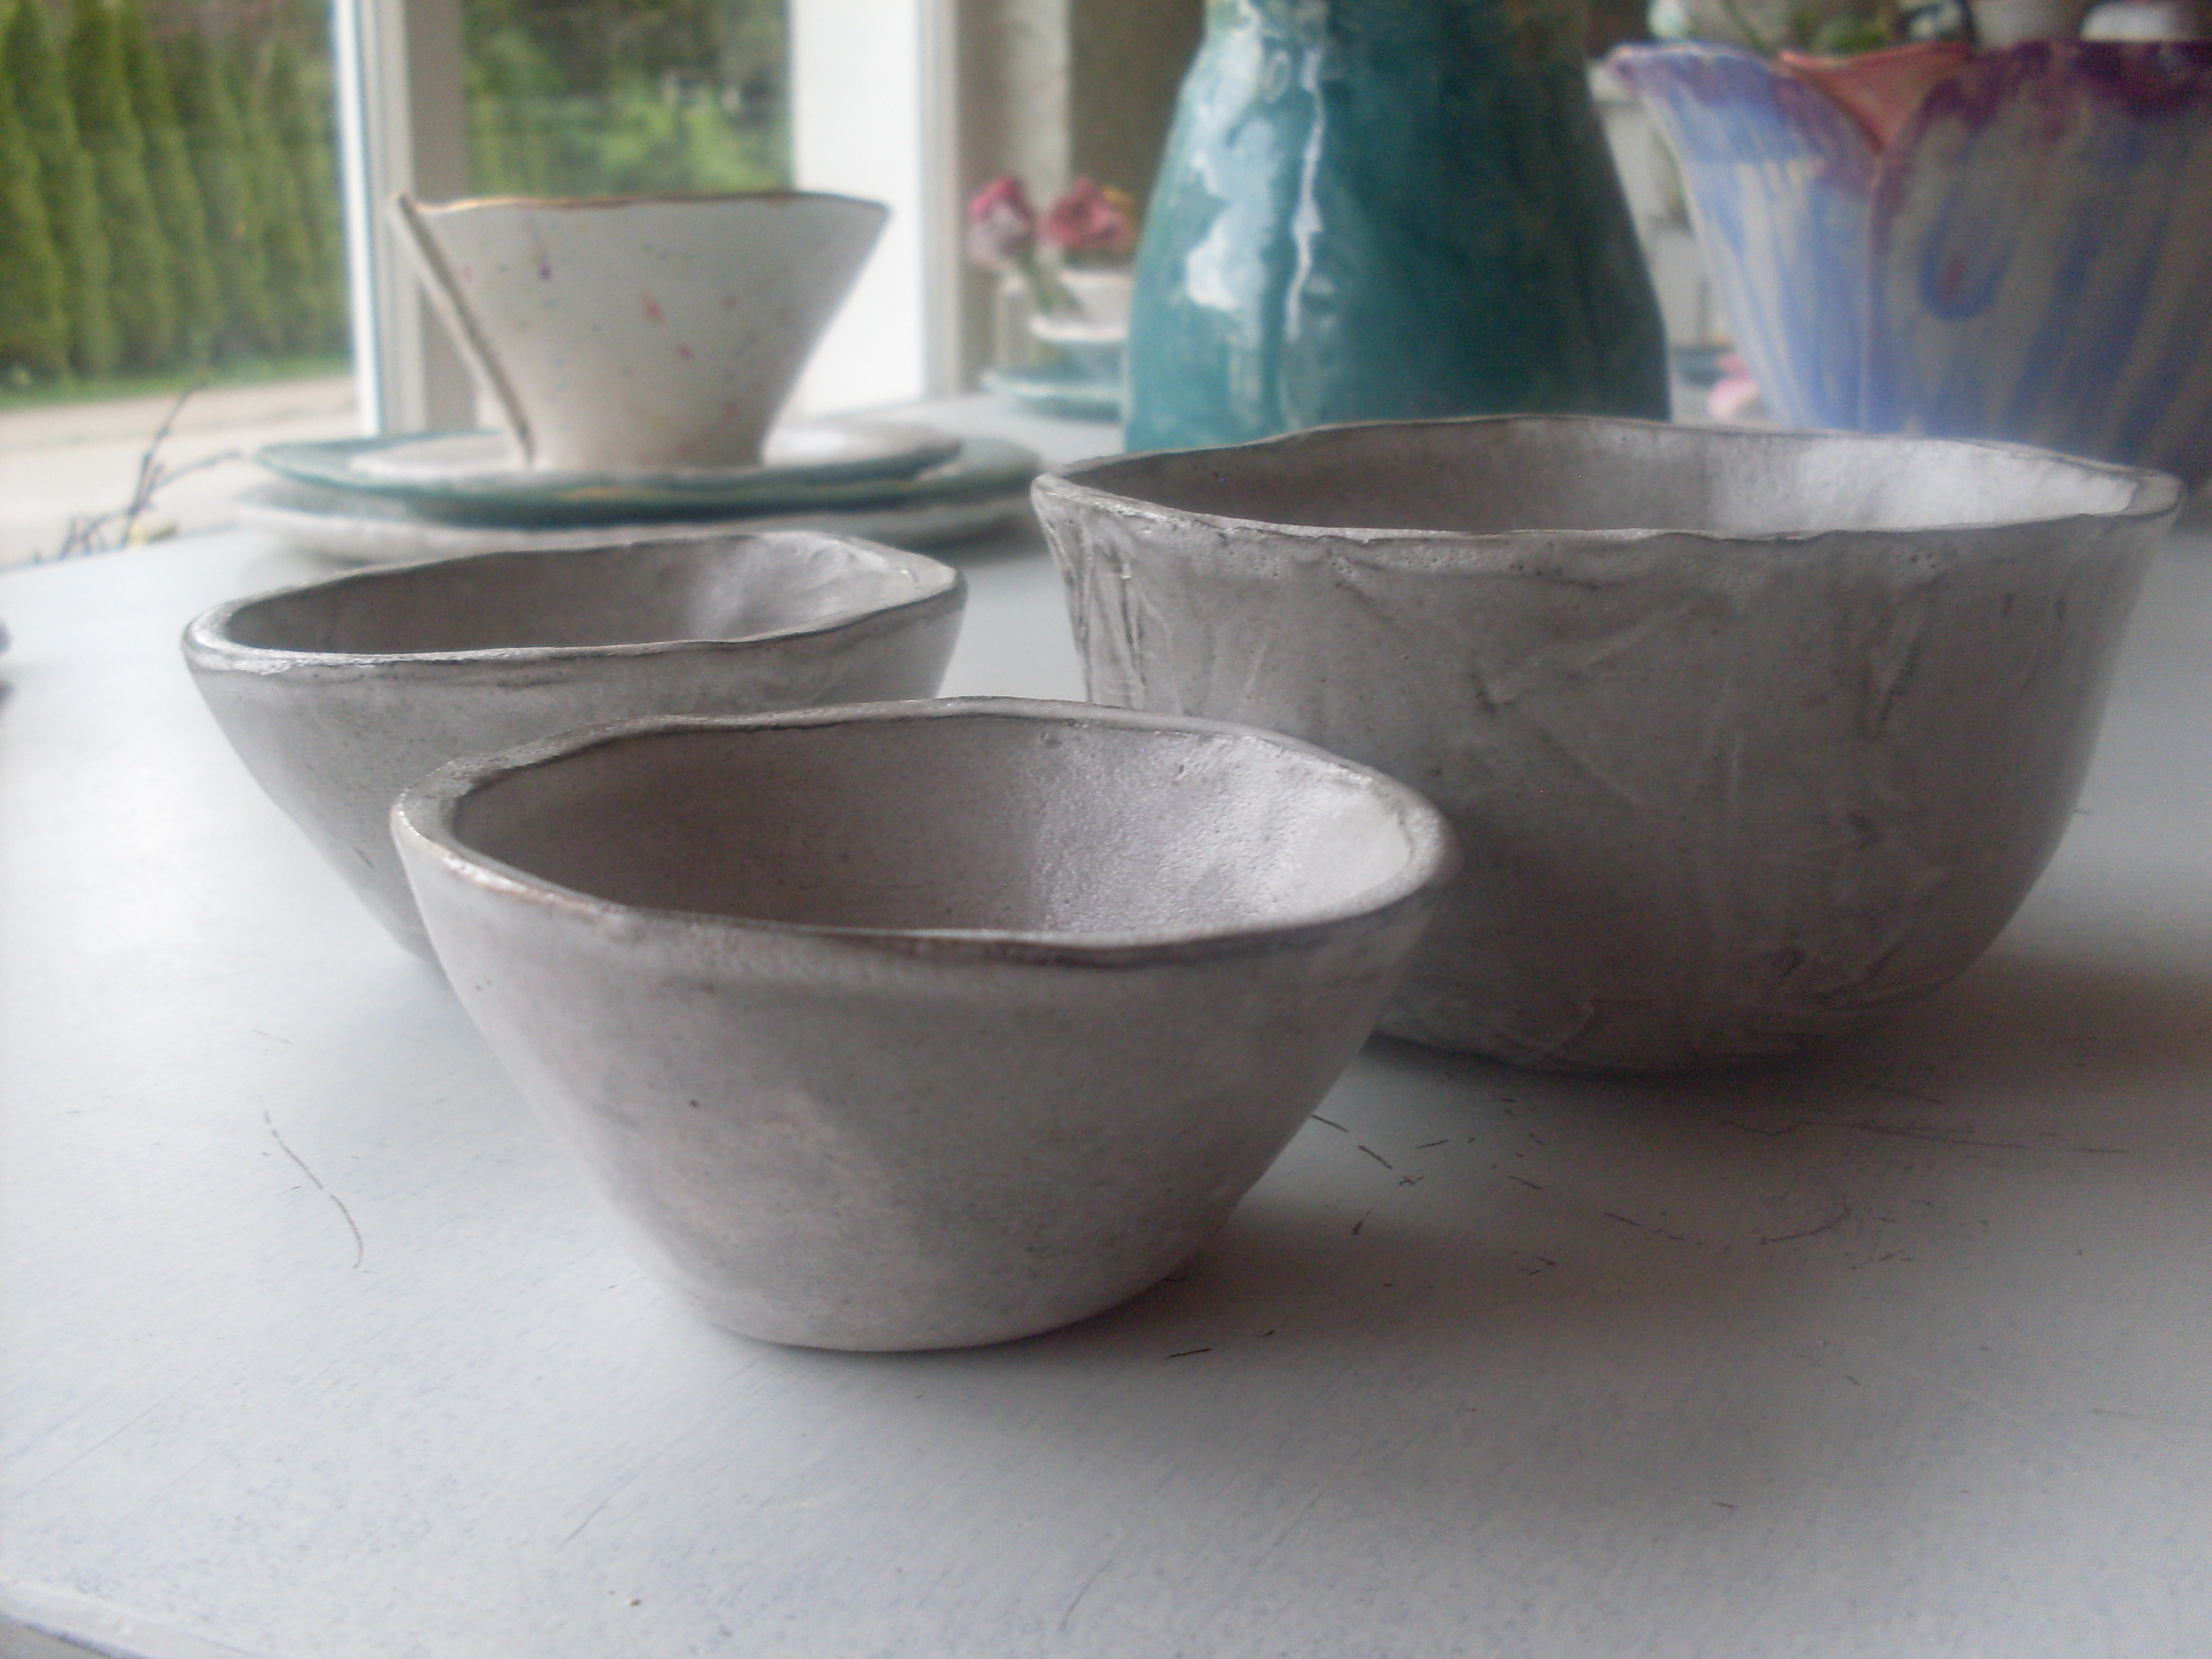 keramik sch ssel 3er set keramik shop. Black Bedroom Furniture Sets. Home Design Ideas